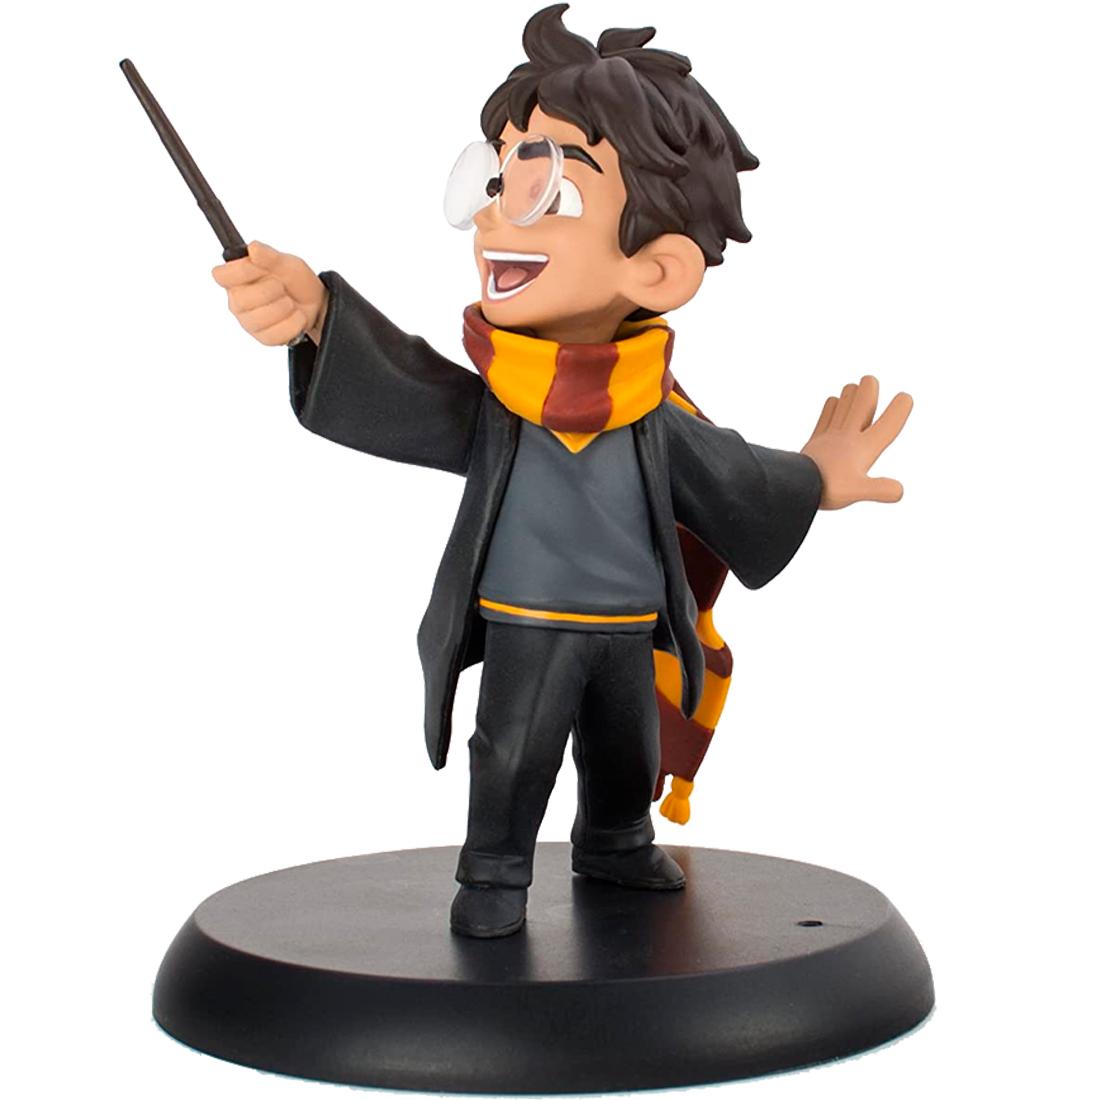 QMx Harry Potter Q-Fig Harry Potter